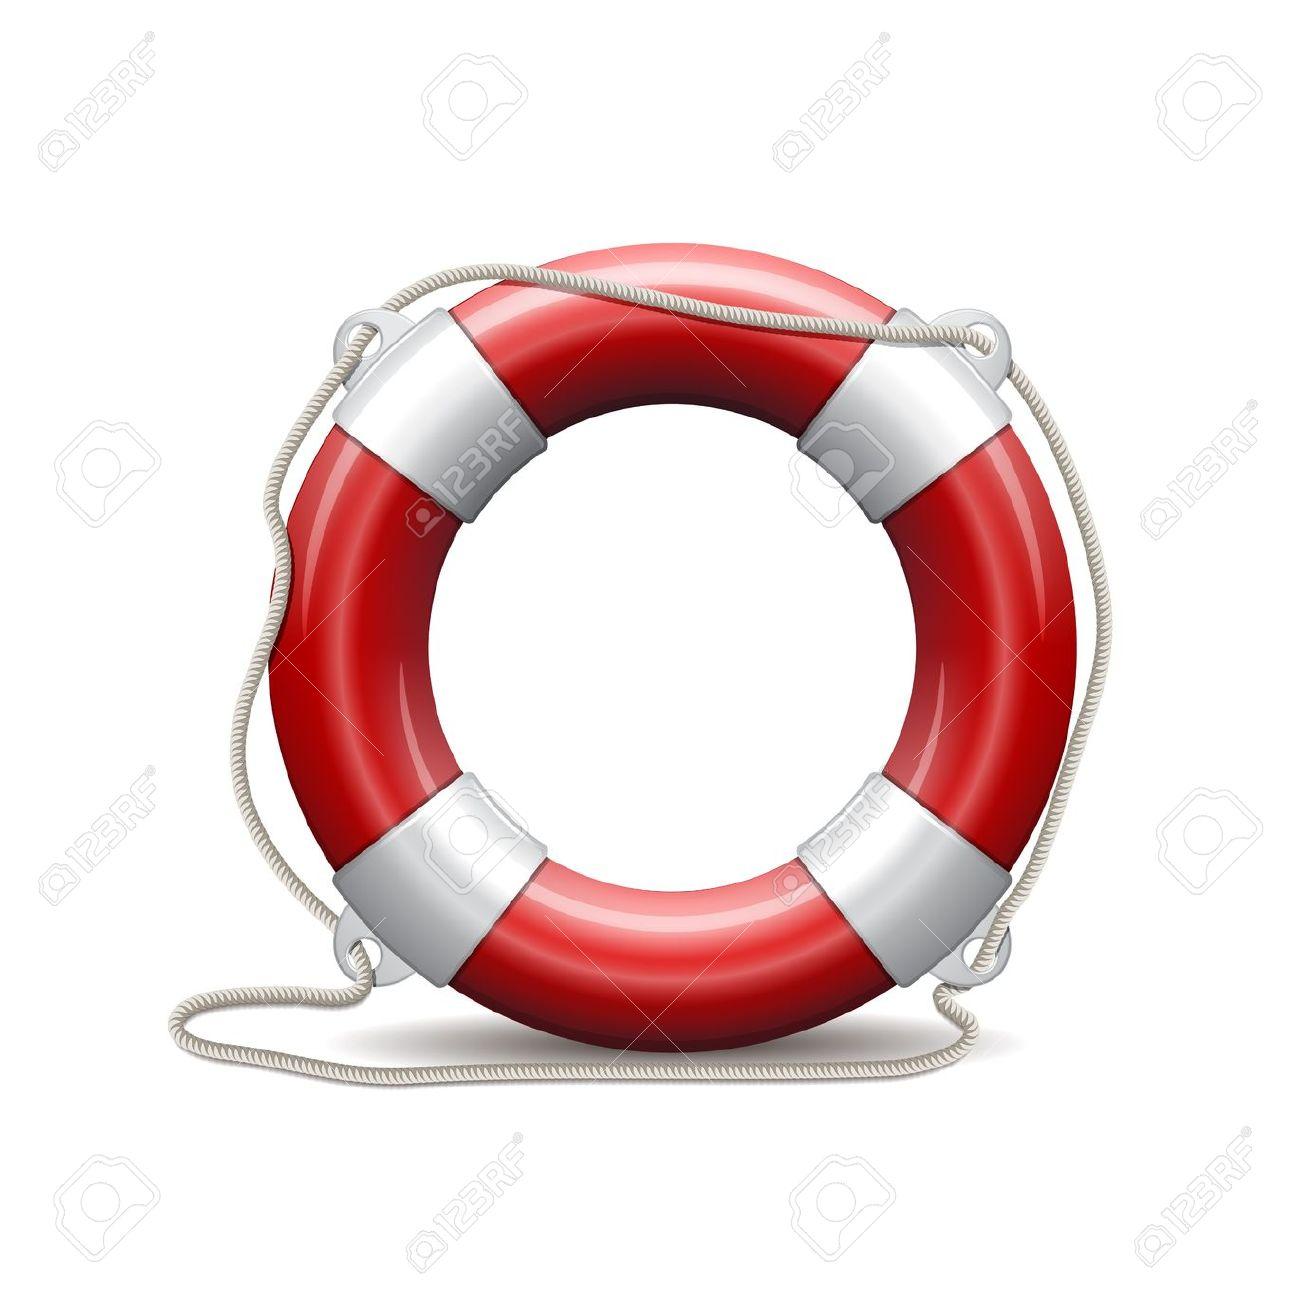 Ring clipart life preserver #6